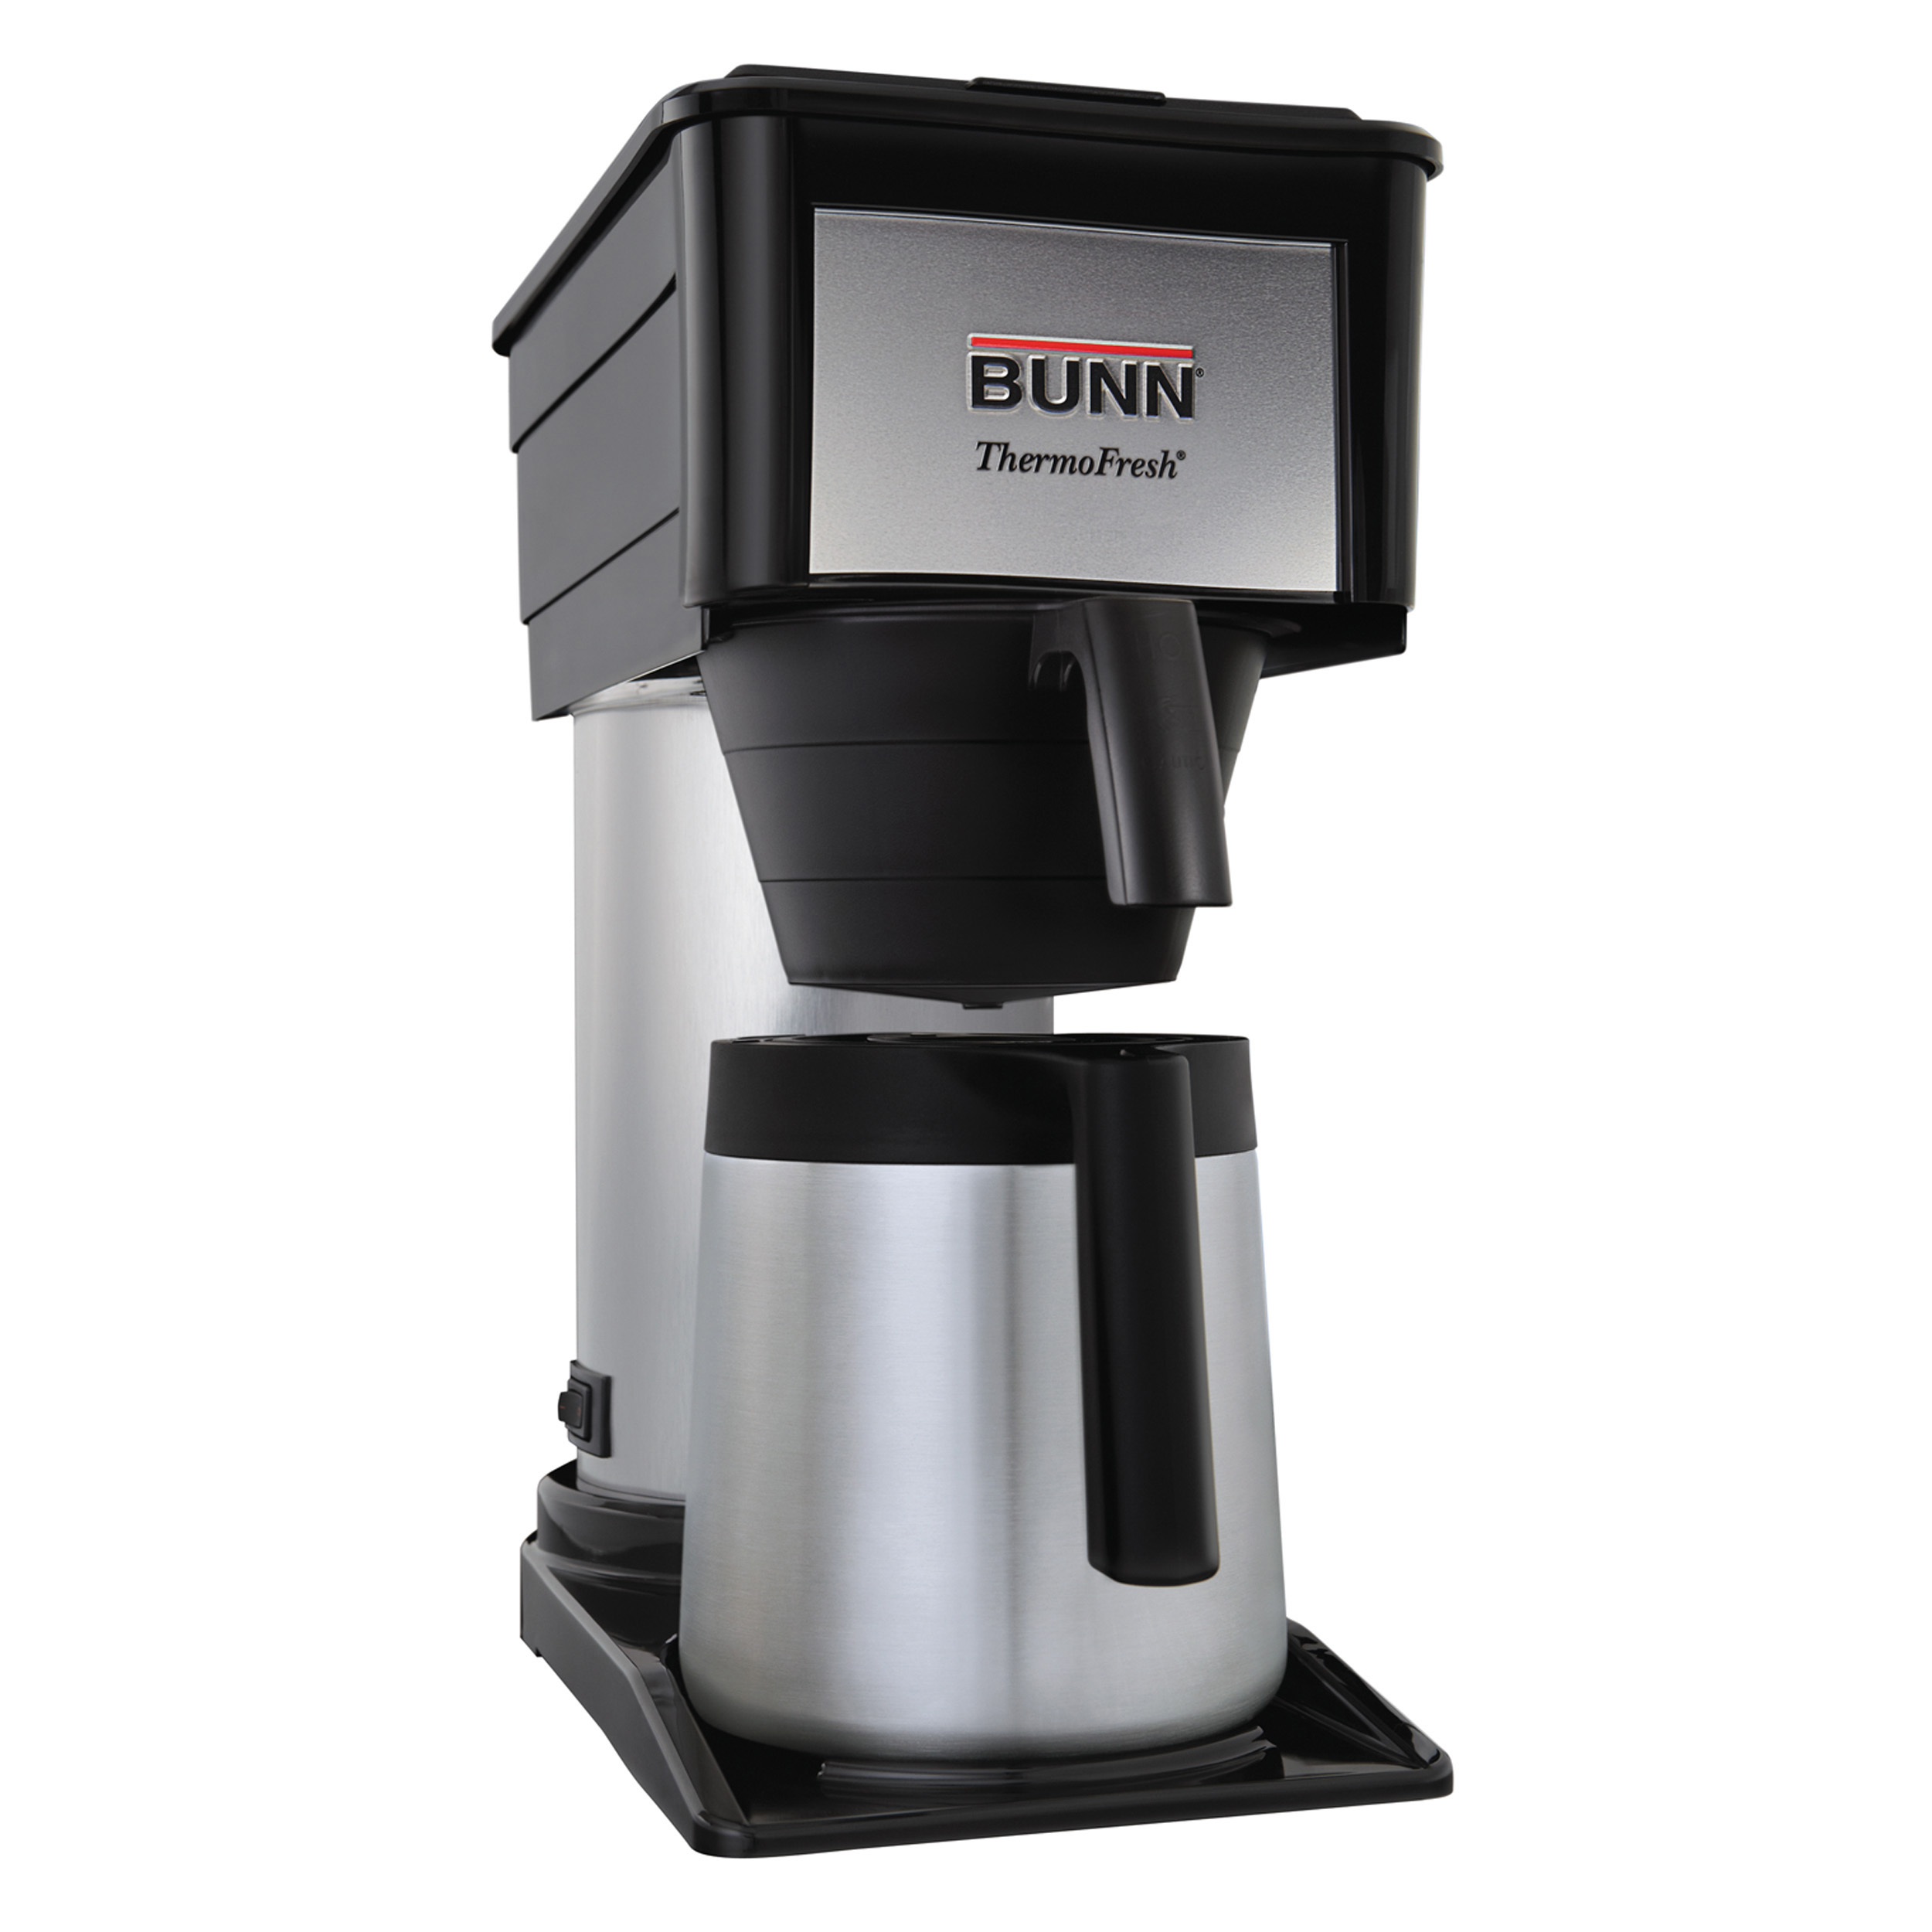 bunn btx b thermofresh 10 cup home thermal carafe coffee brewer blackbunn model bx wiring diagram [ 2500 x 2500 Pixel ]